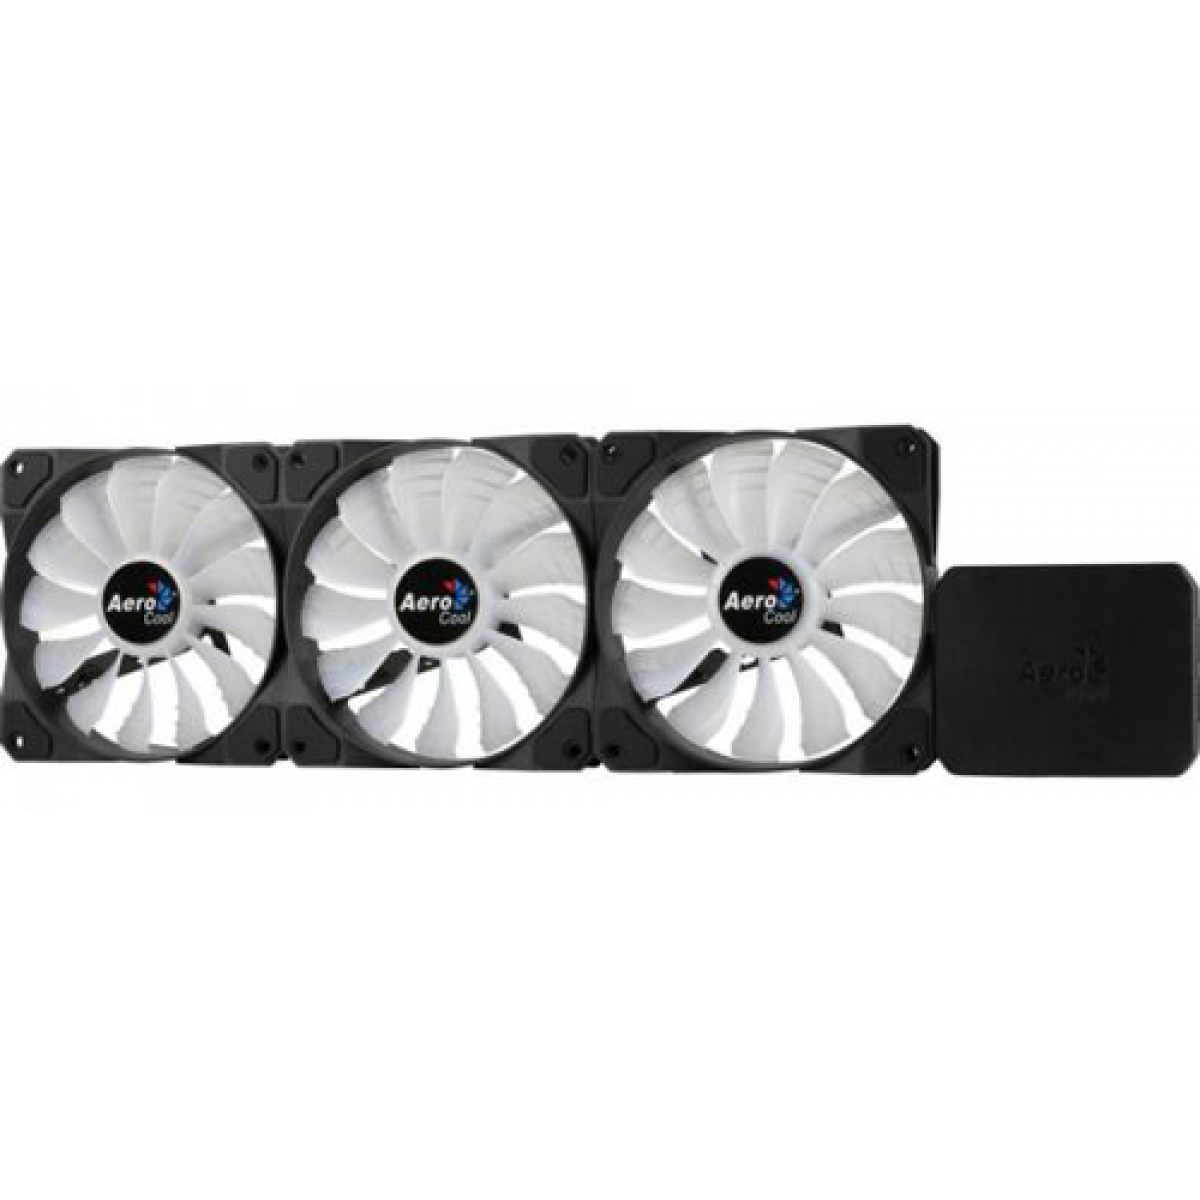 Kit com 3 Fans Aerocool Project 7 120mm Led RGB P7-F12 PRO